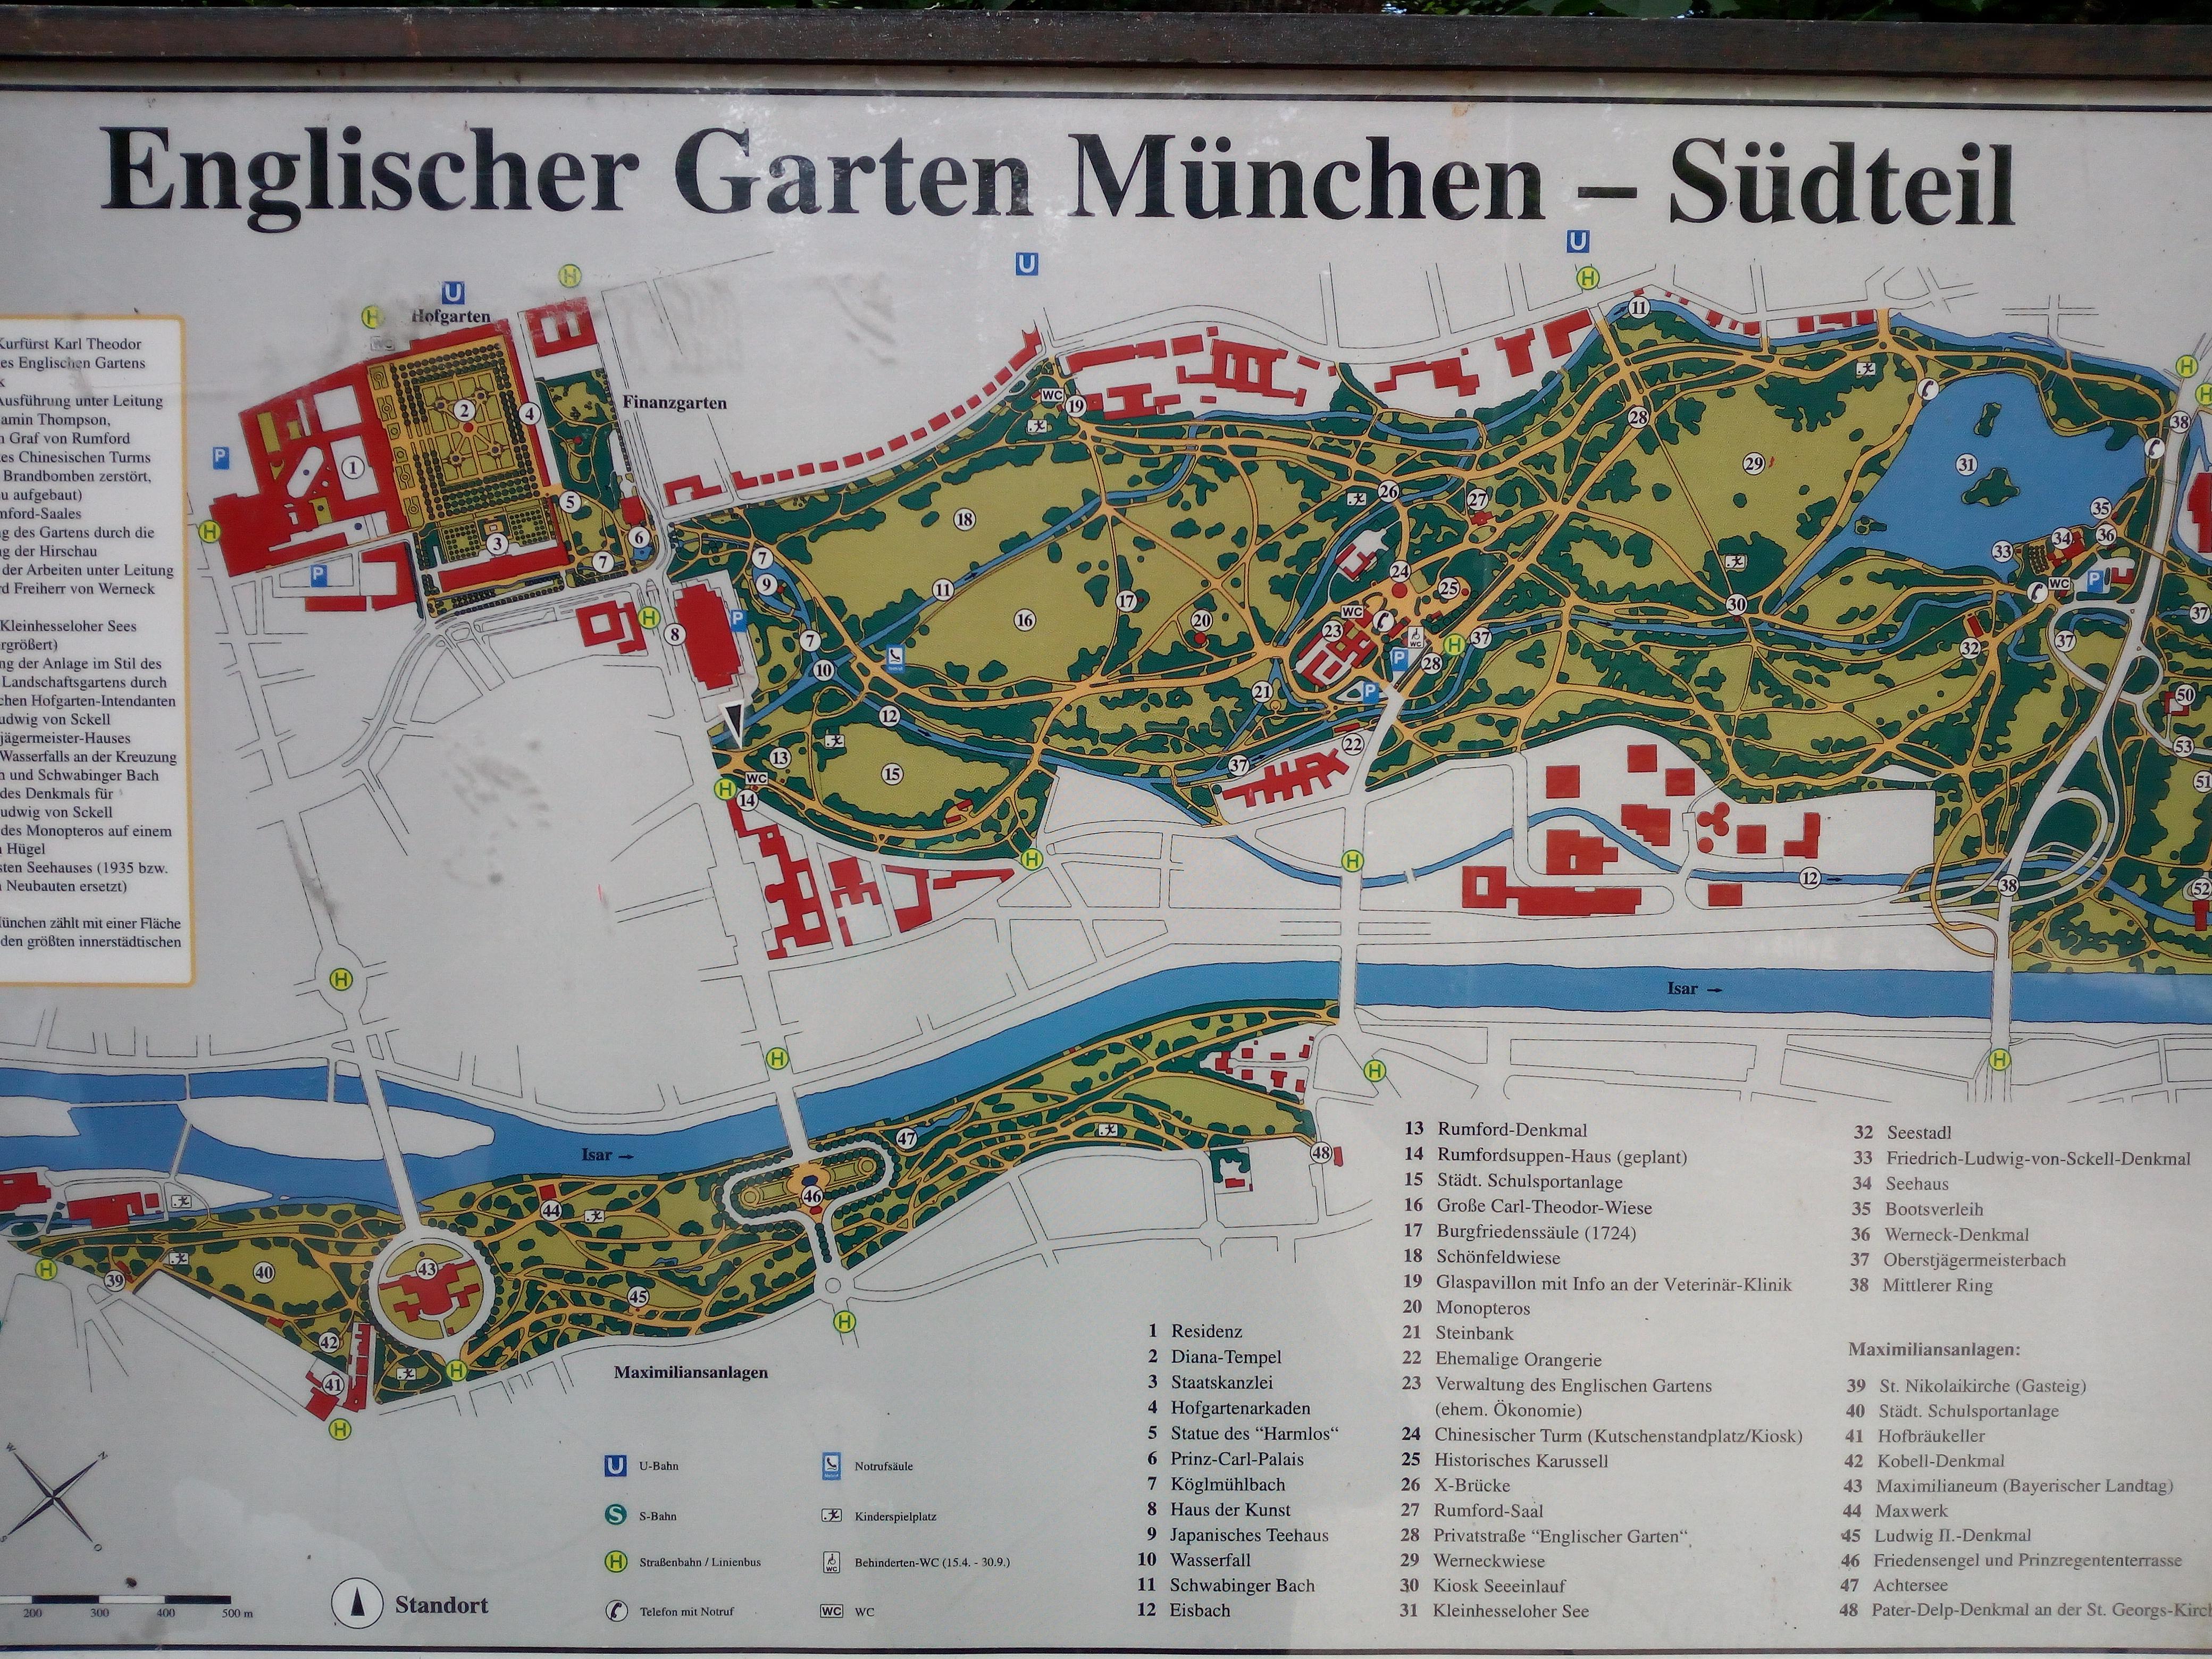 Map of the Englischer Garten in Munich